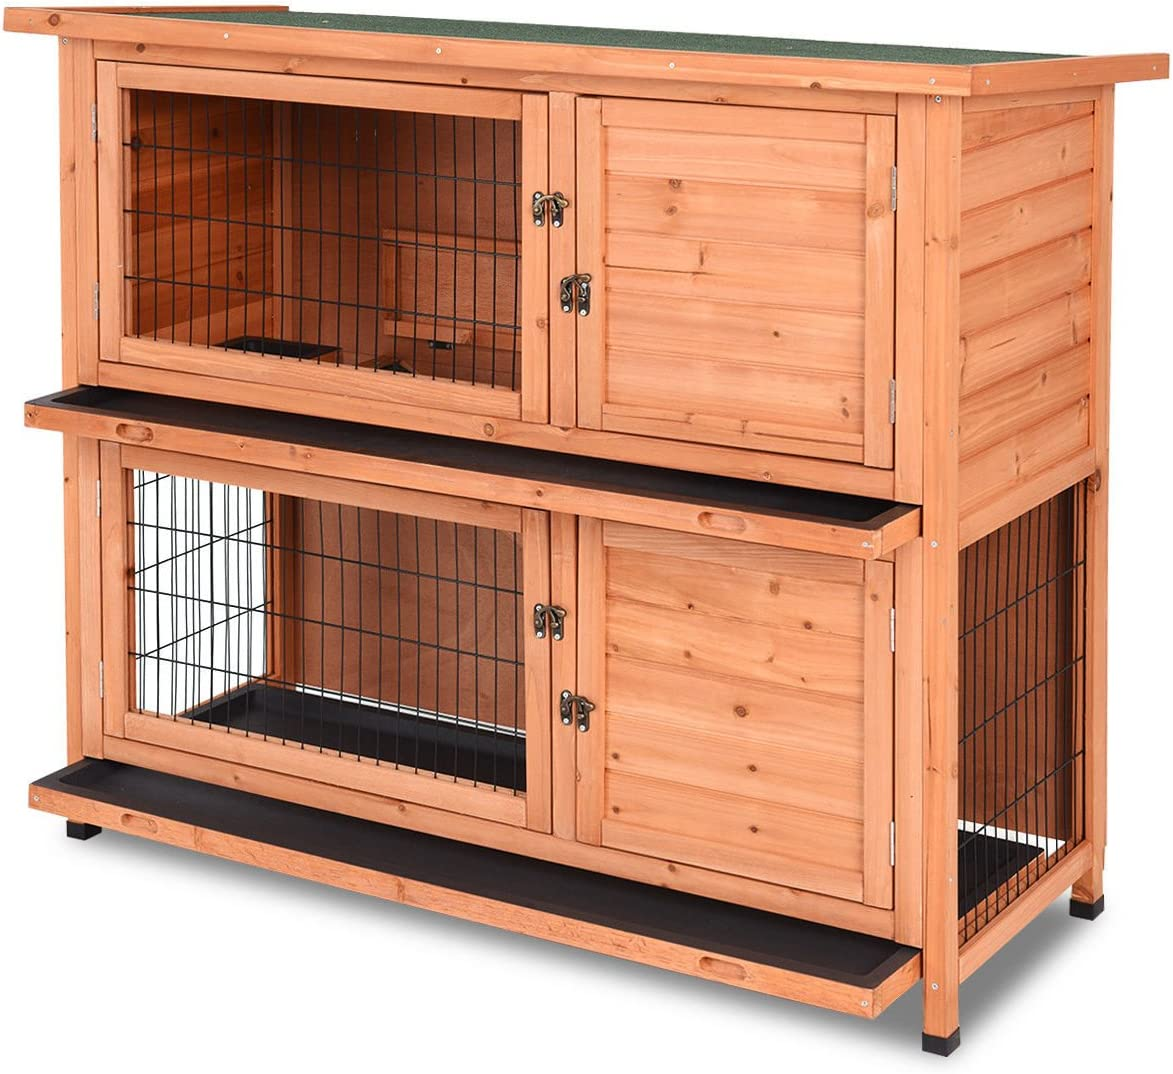 Tangkula Chicken Coop 8 Rabbit Hutch Wooden Garden Backyard Bunny ...